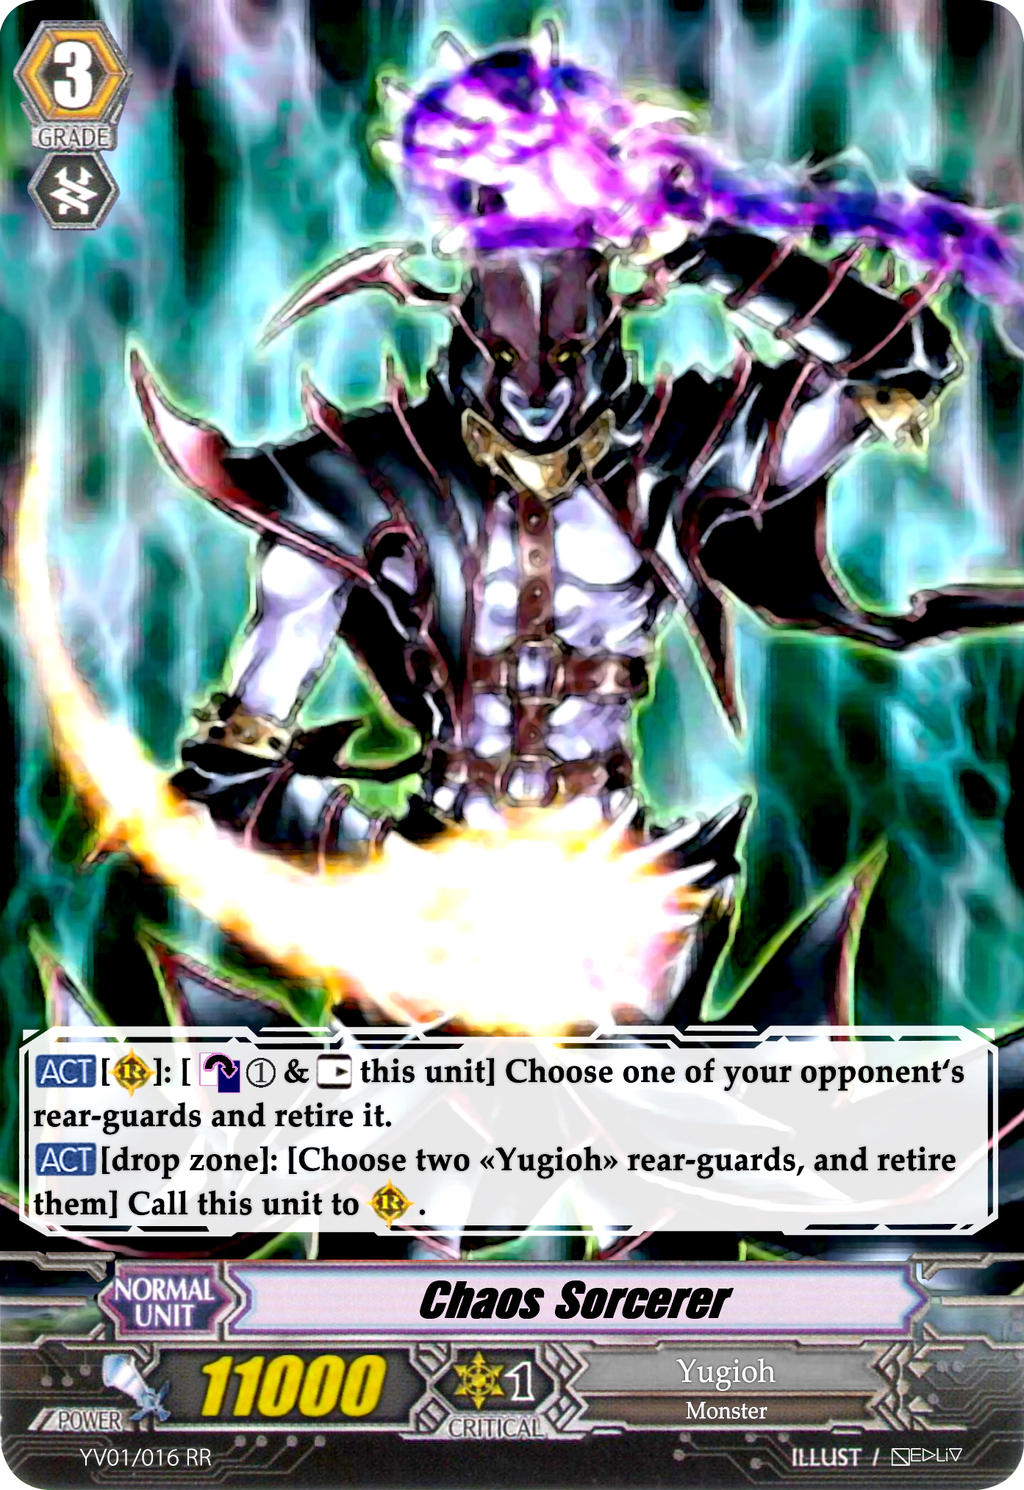 Chaos Sorcerer - Vanguard Card by Nedliv on DeviantArt